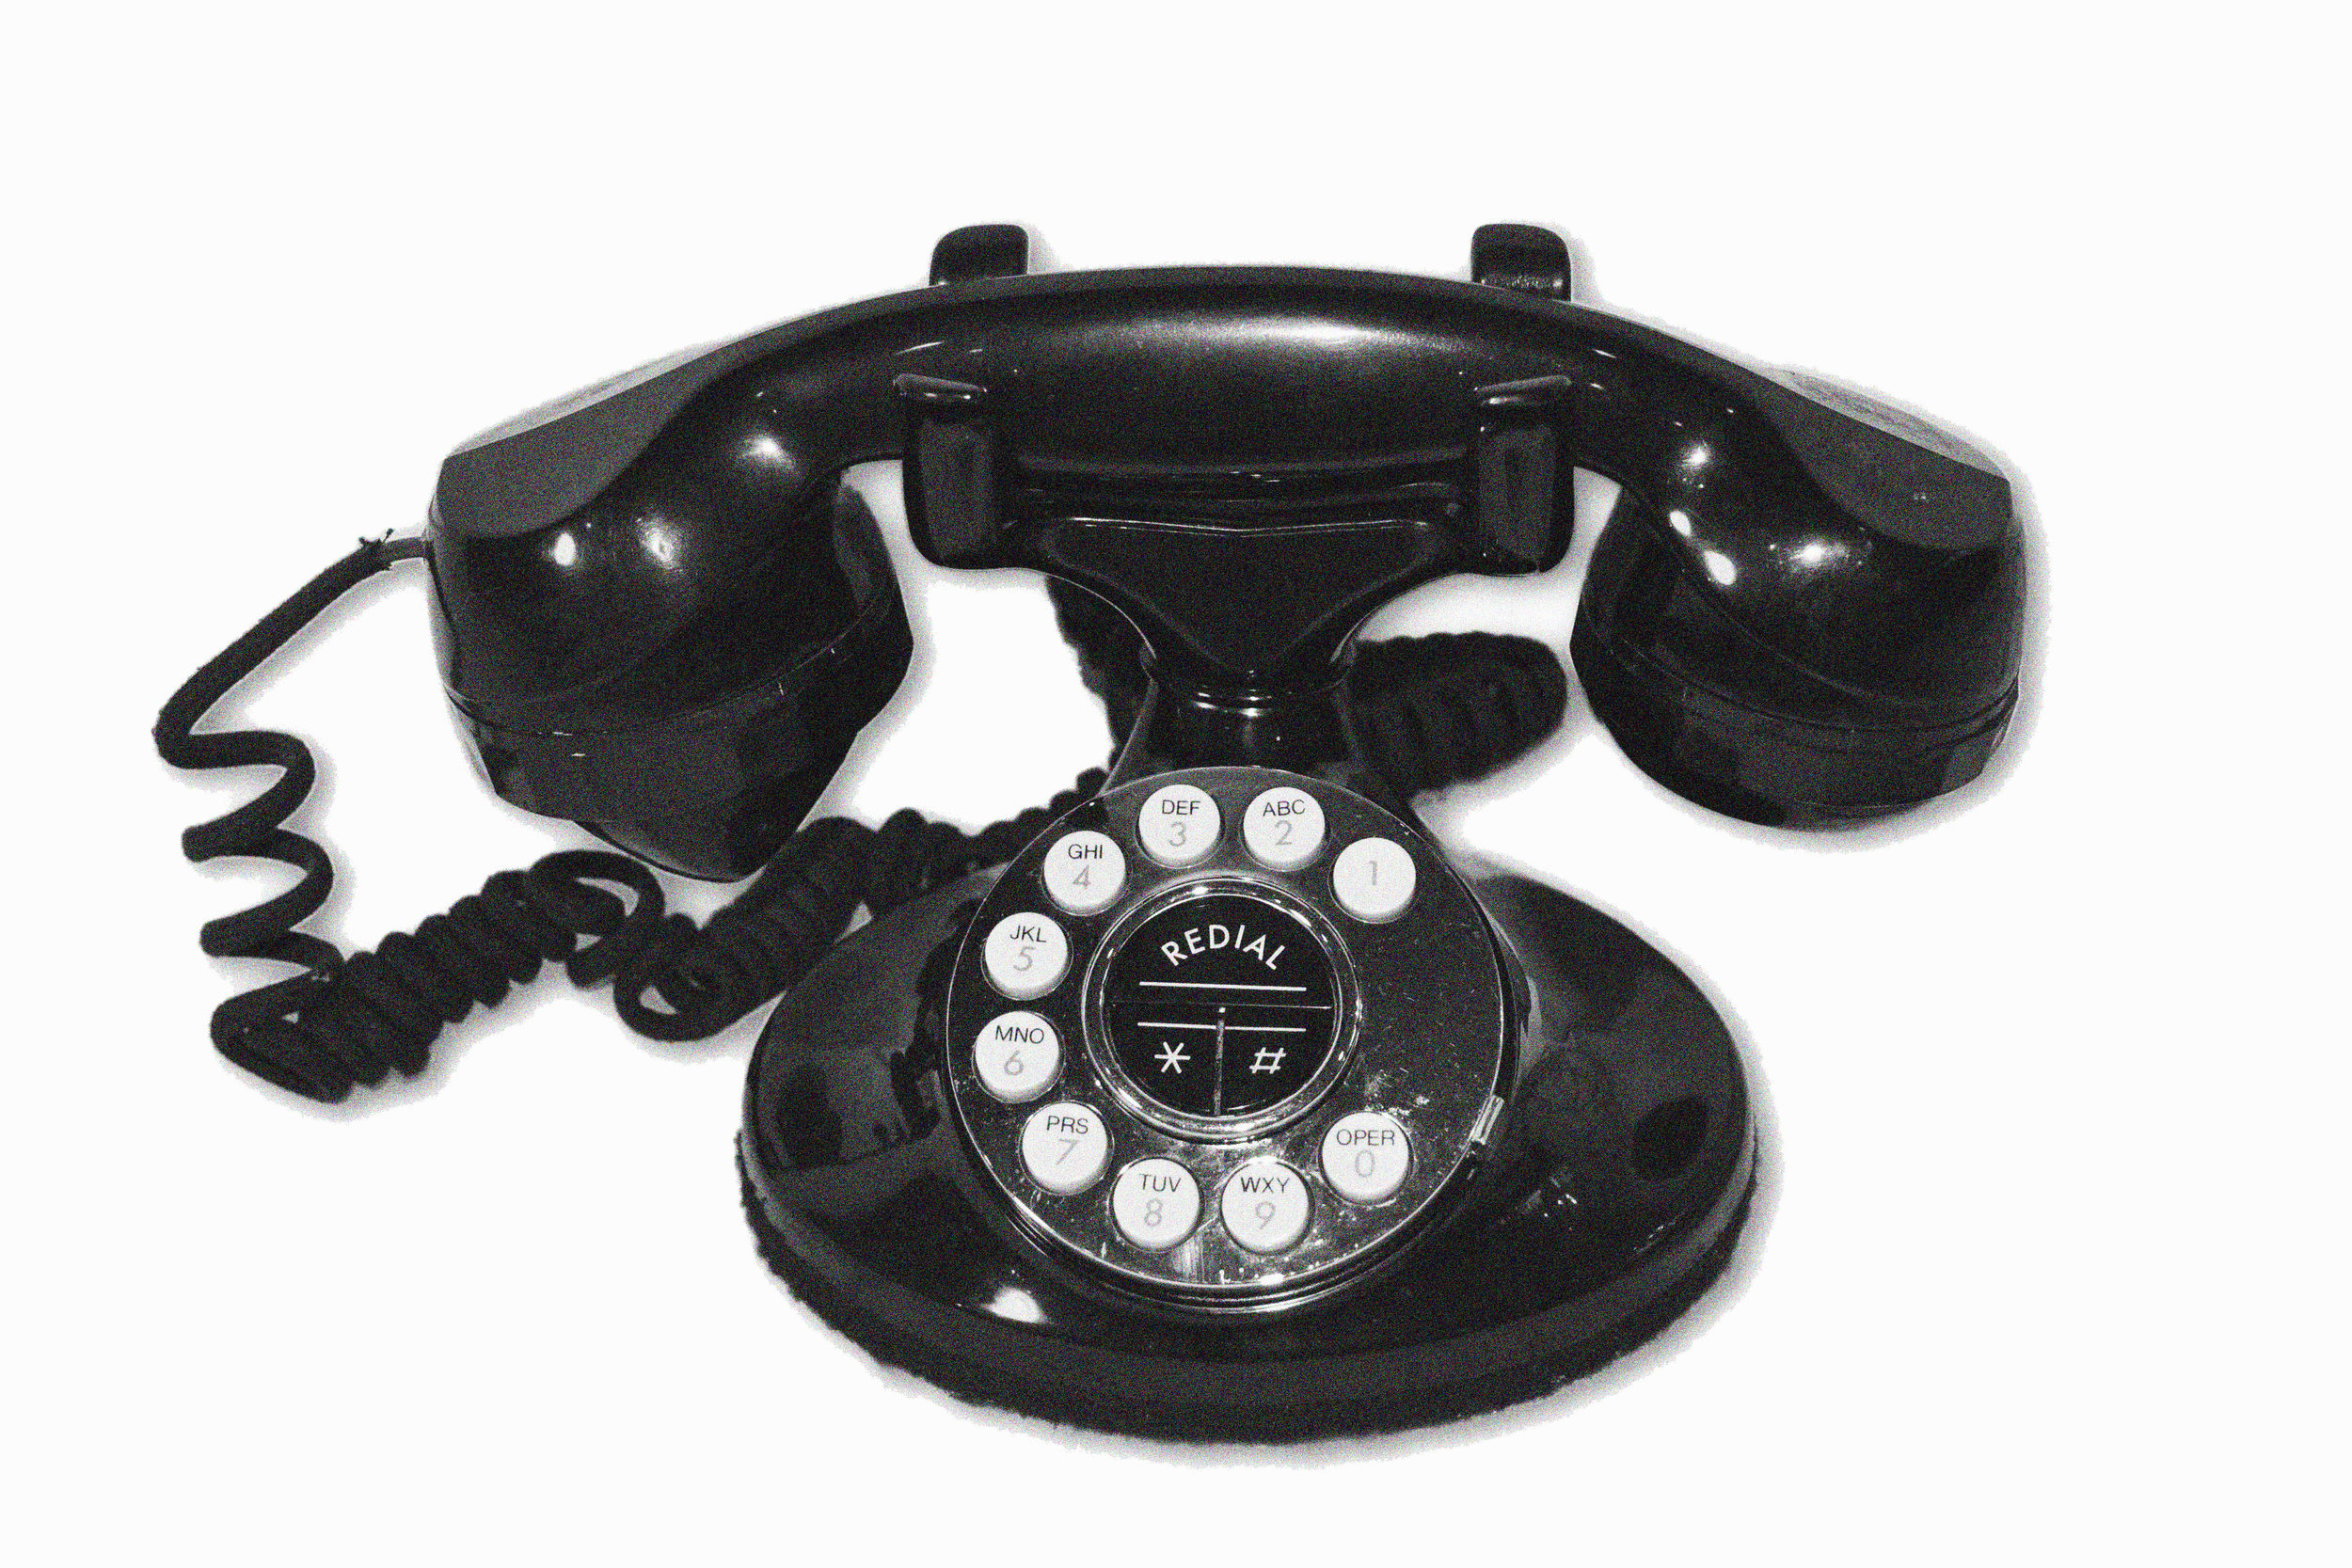 black roatary phone 2 grainy 2.jpg